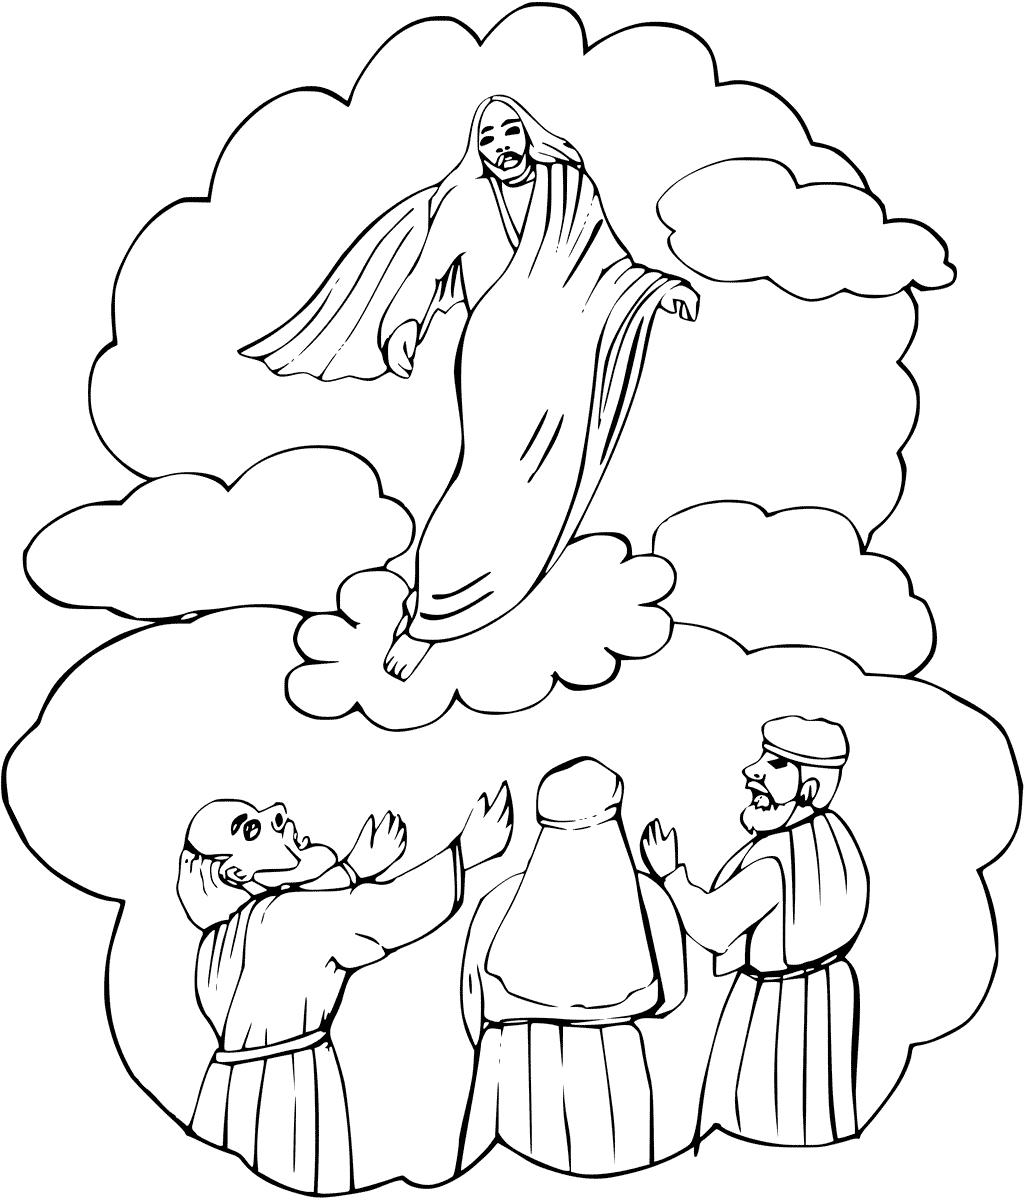 Jesus resurrection coloring page - Topcoloringpages.net | 1200x1024